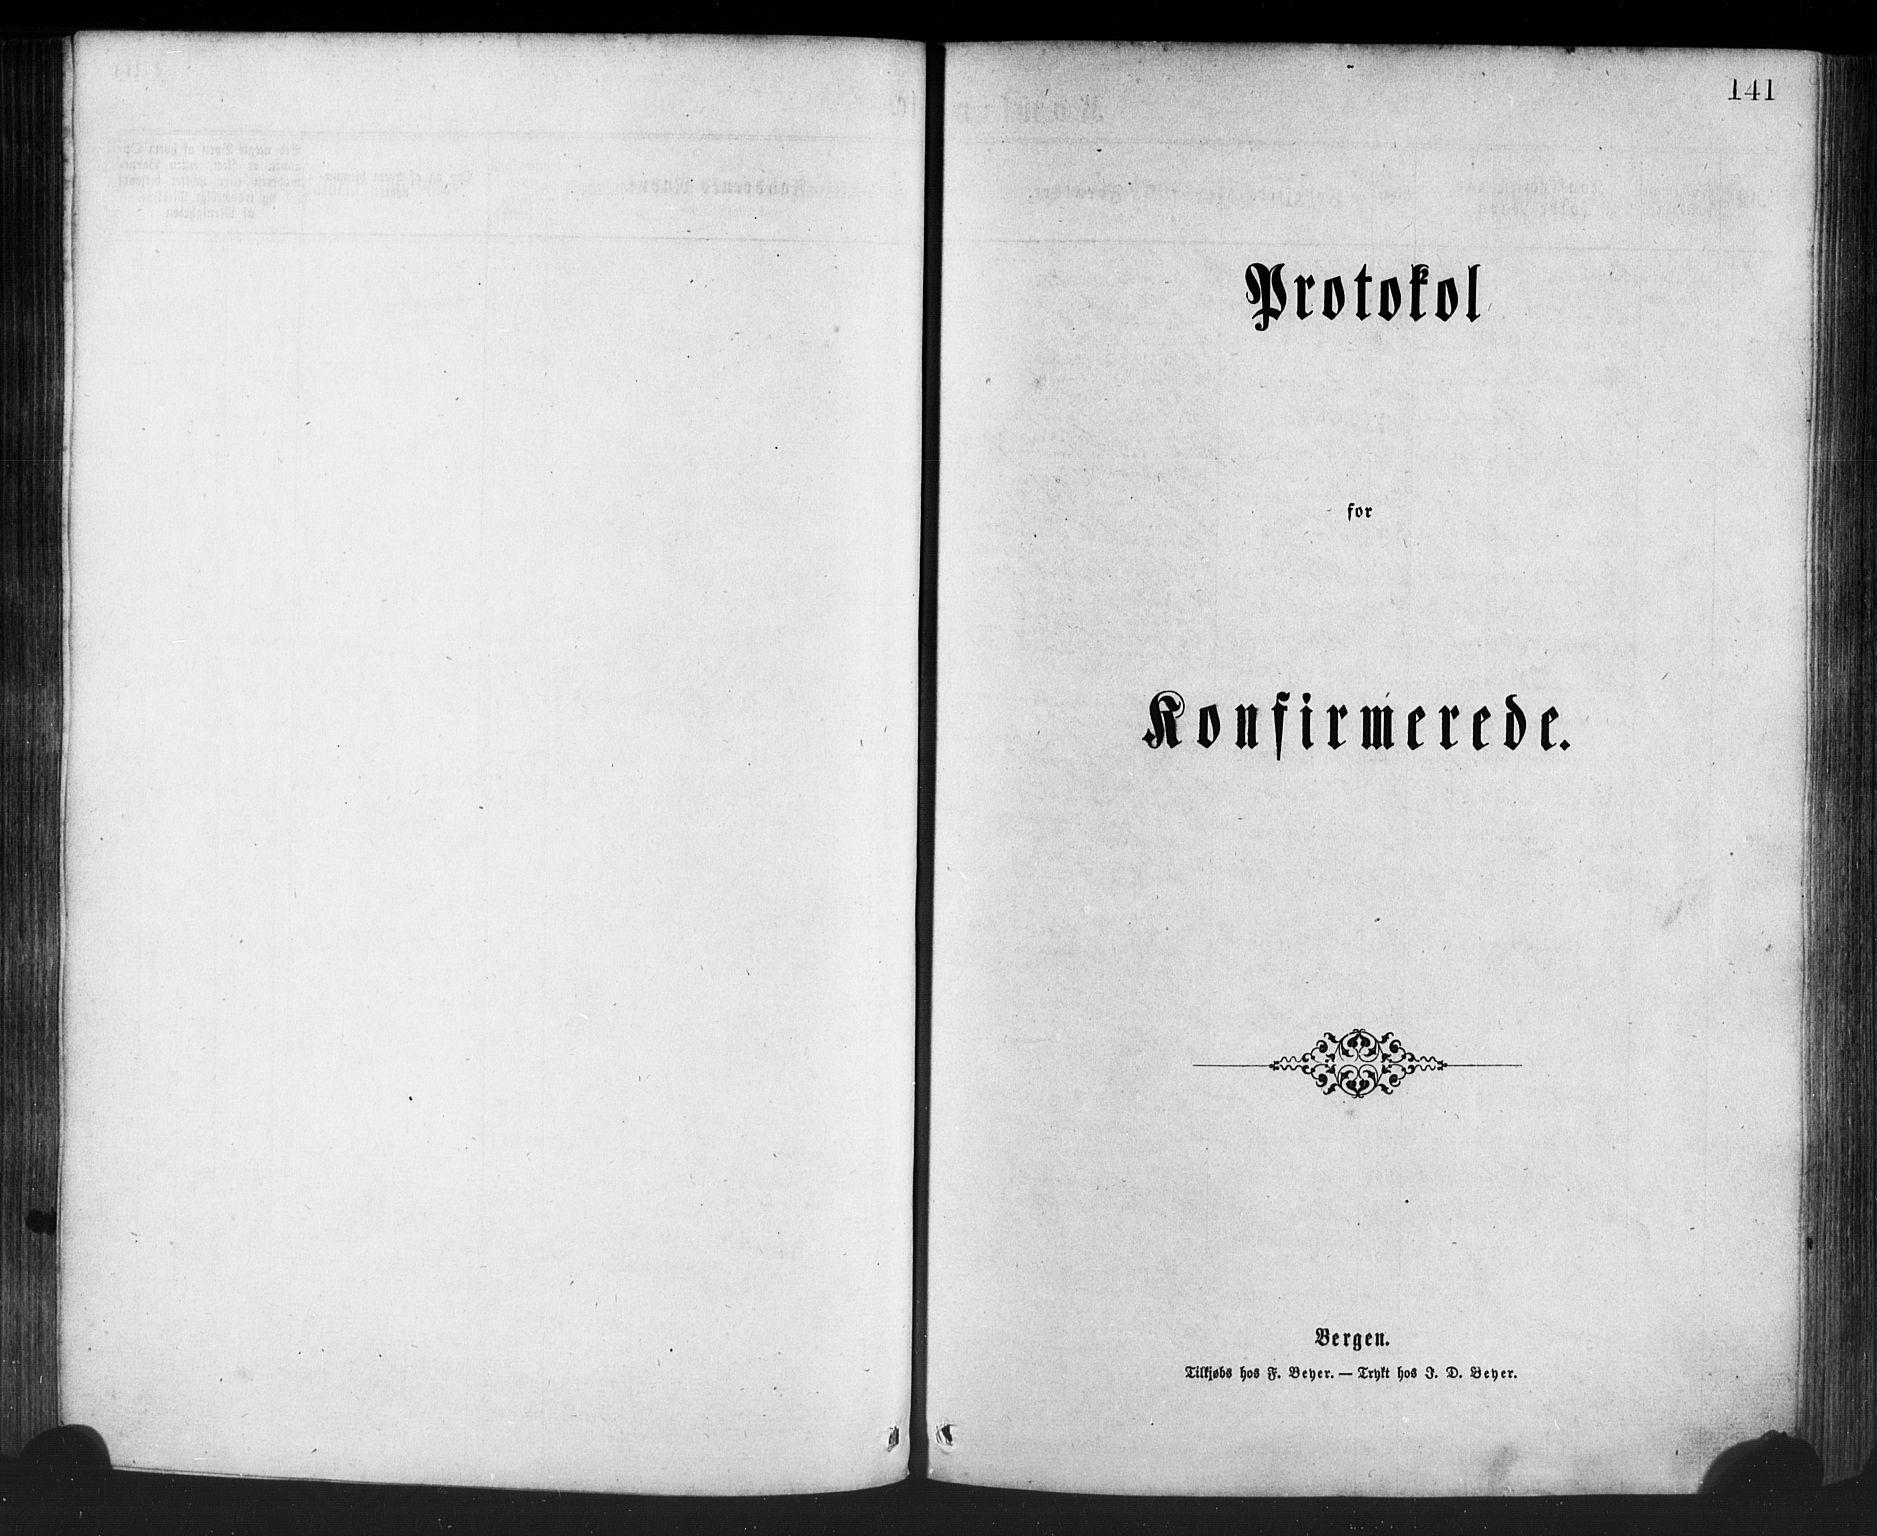 SAB, Manger sokneprestembete, H/Haa: Ministerialbok nr. A 8, 1871-1880, s. 141